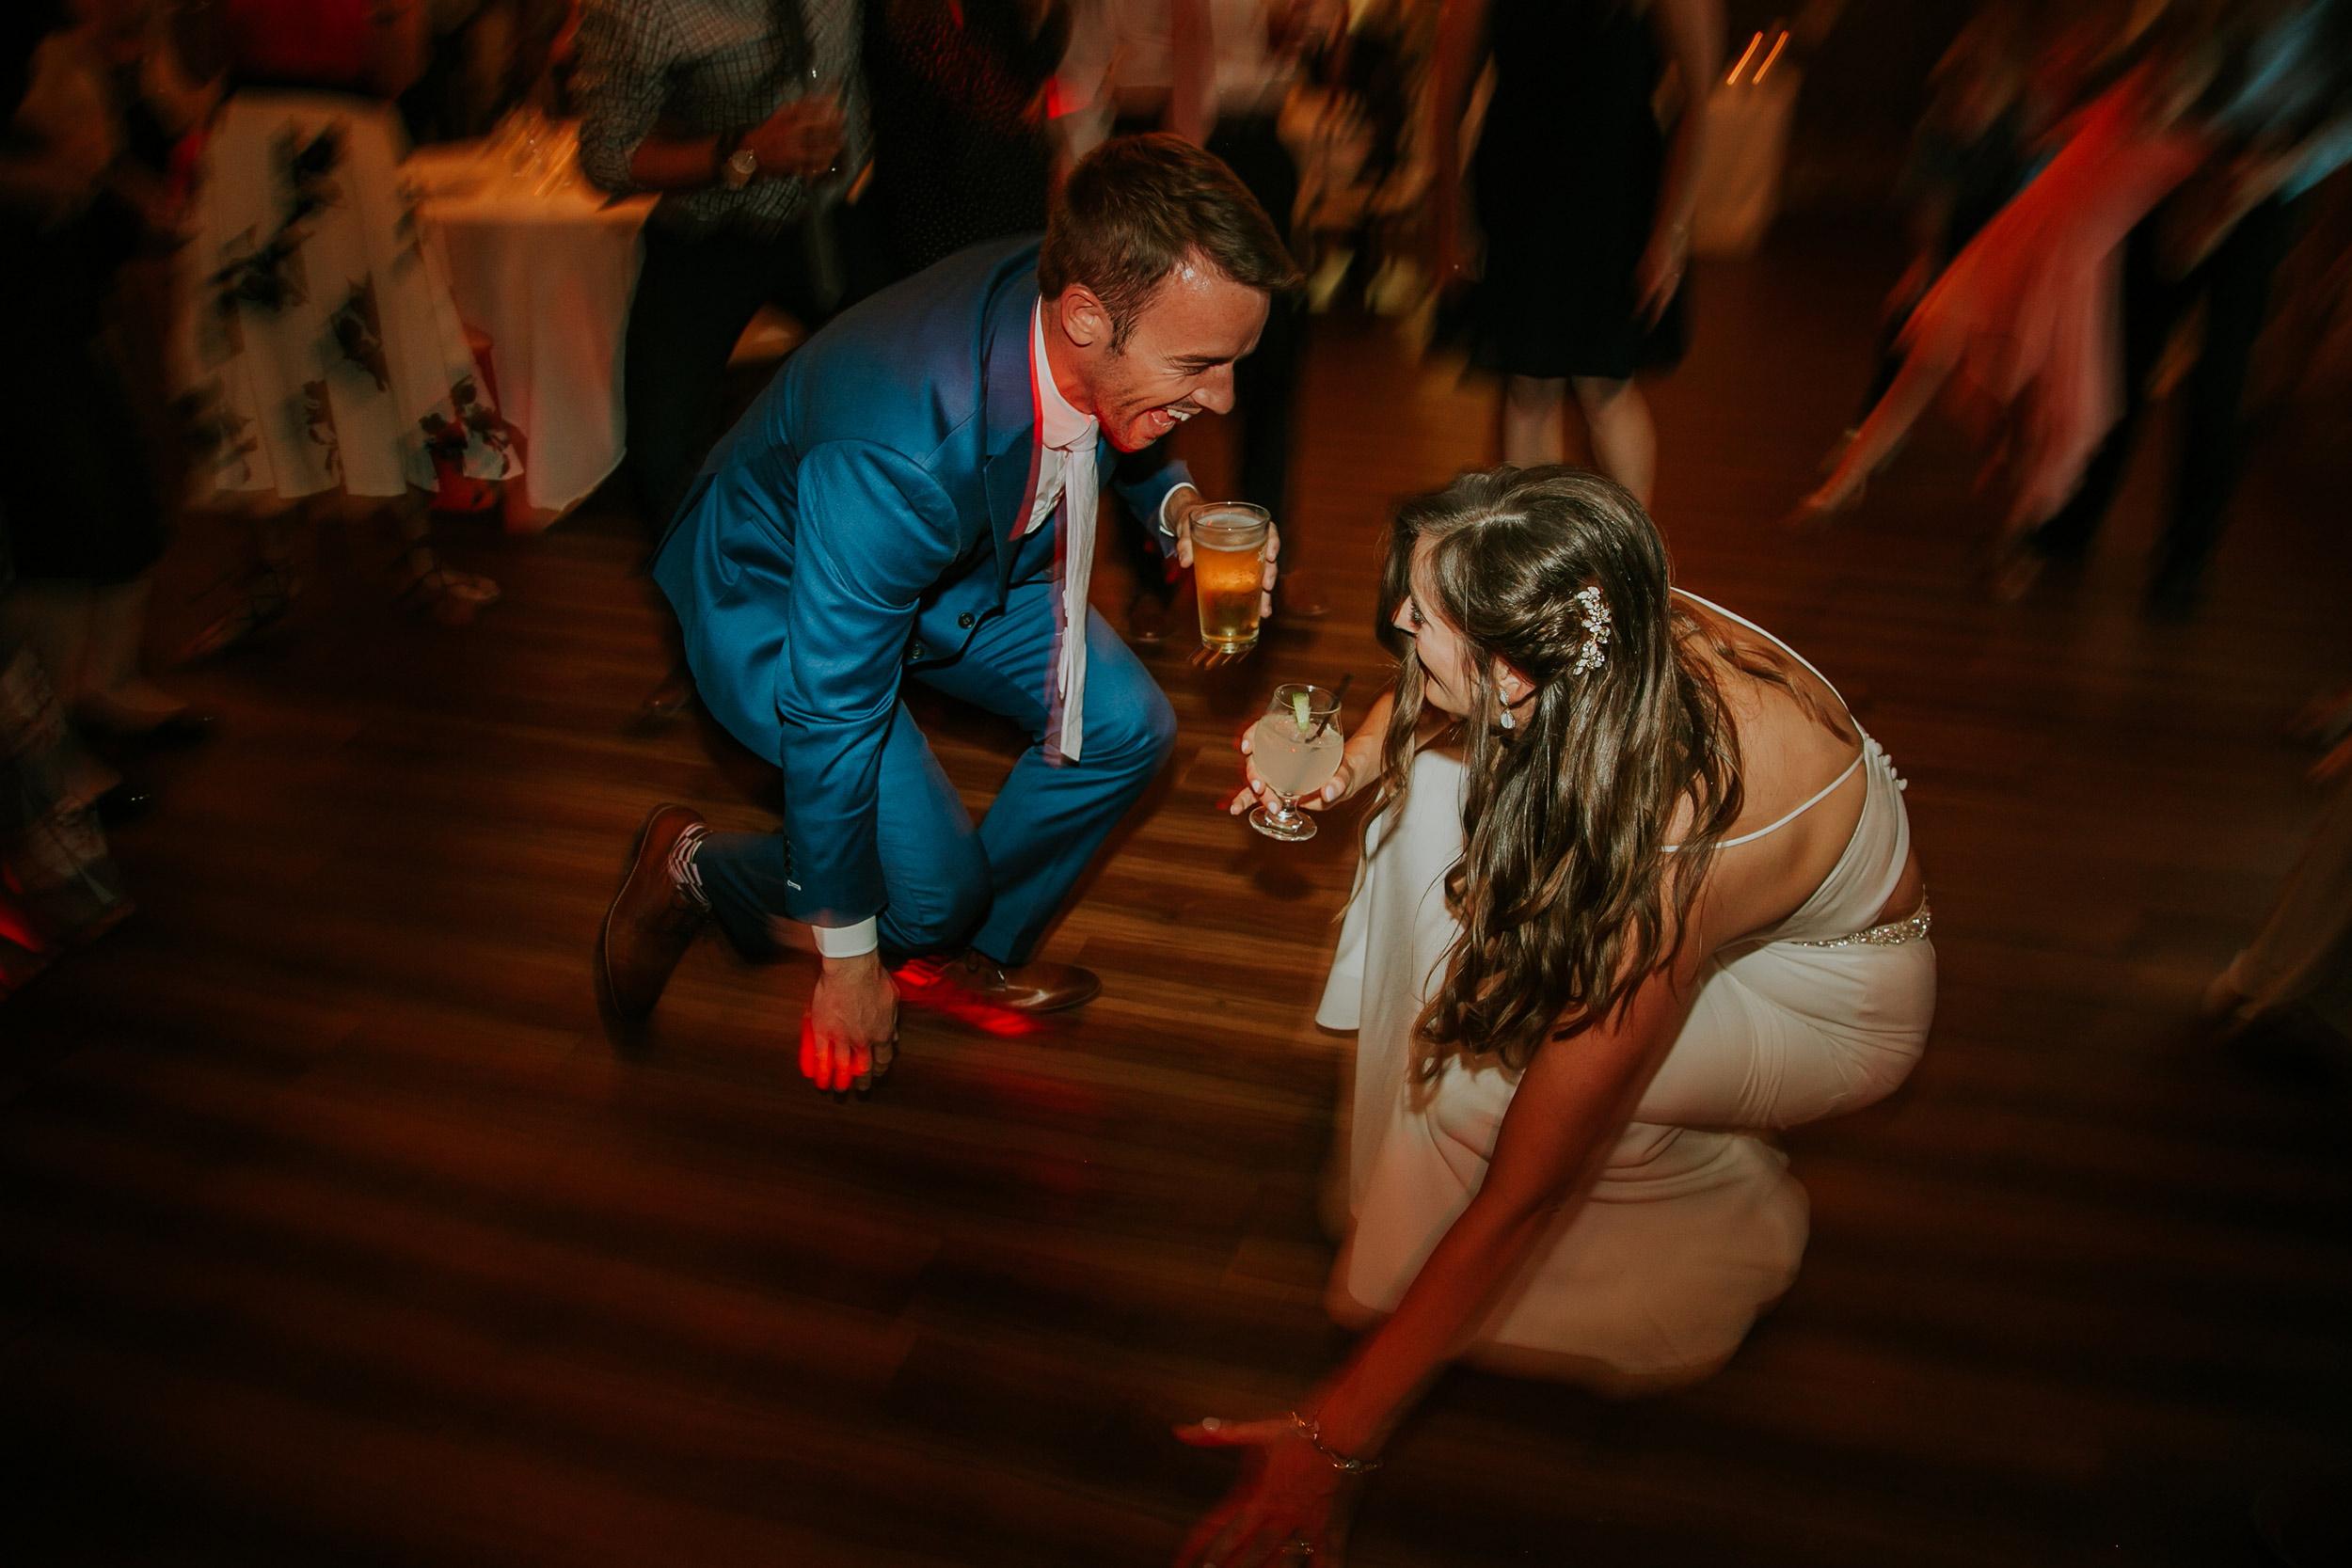 mr-mrs-hull-couple-dancing-on-floor-iowa-taproom-desmoines-iowa-raelyn-ramey-photography-19.jpg